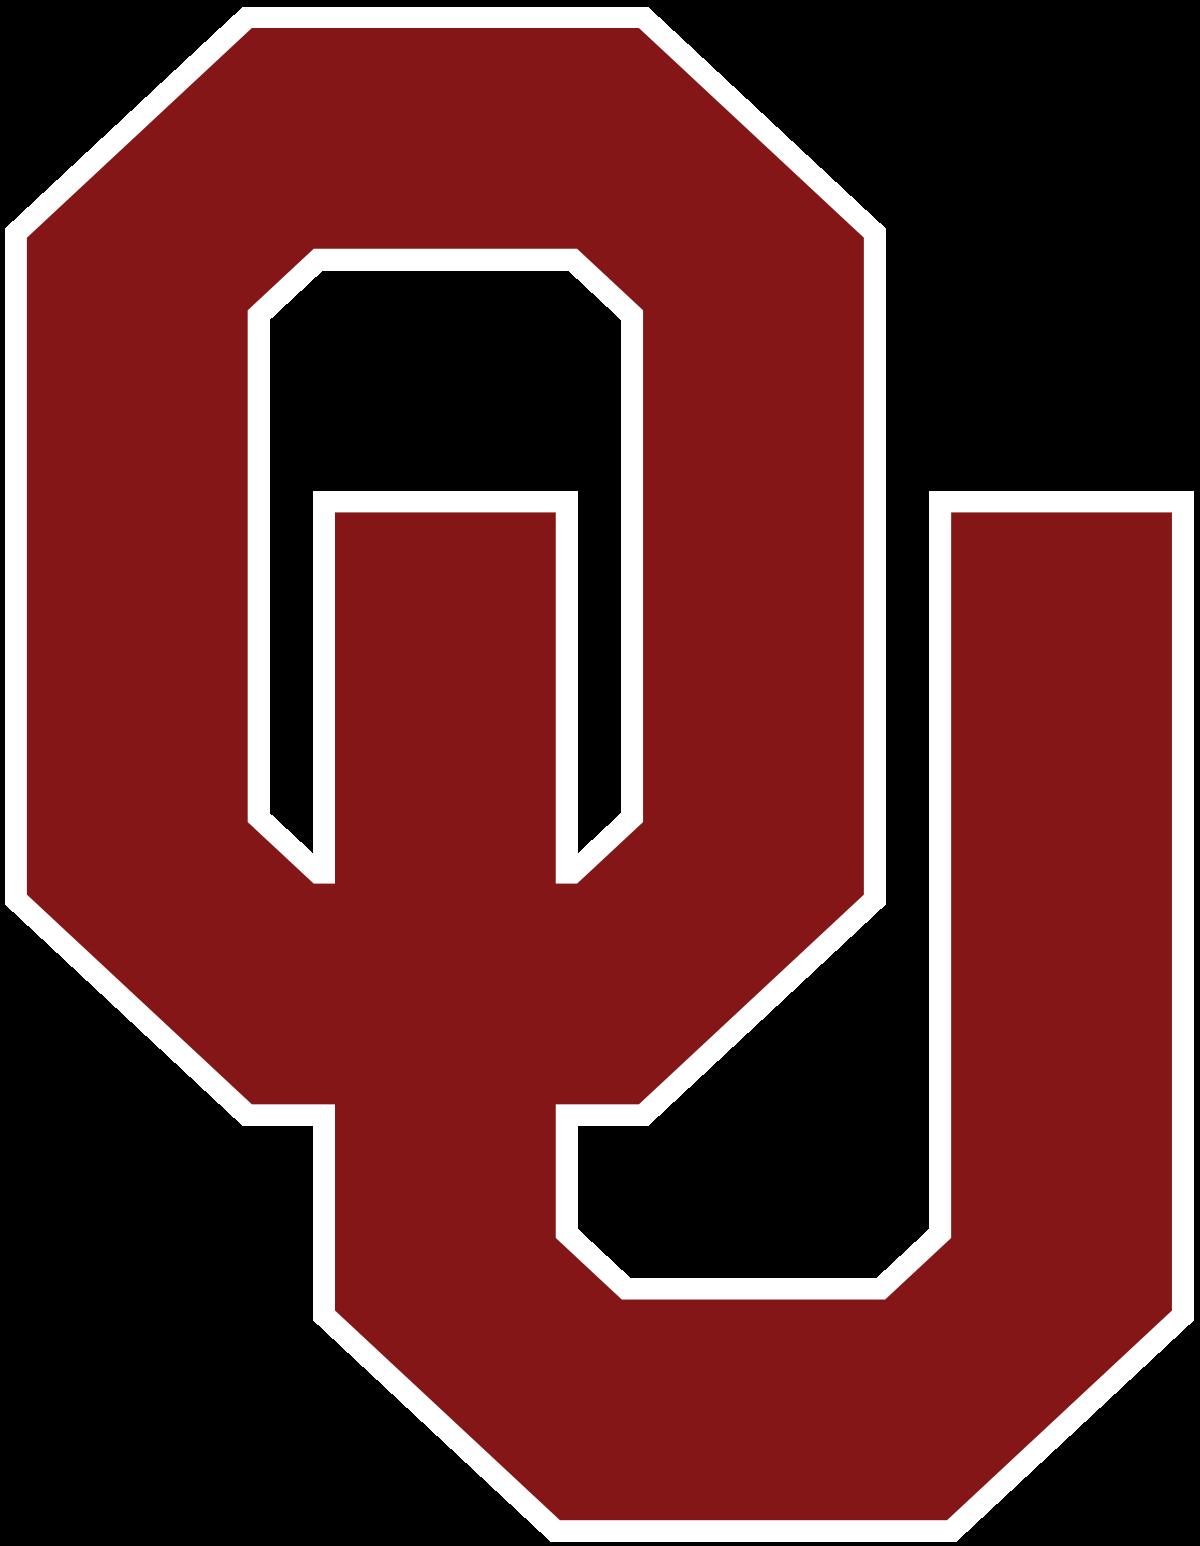 Oklahoma Sooners football.